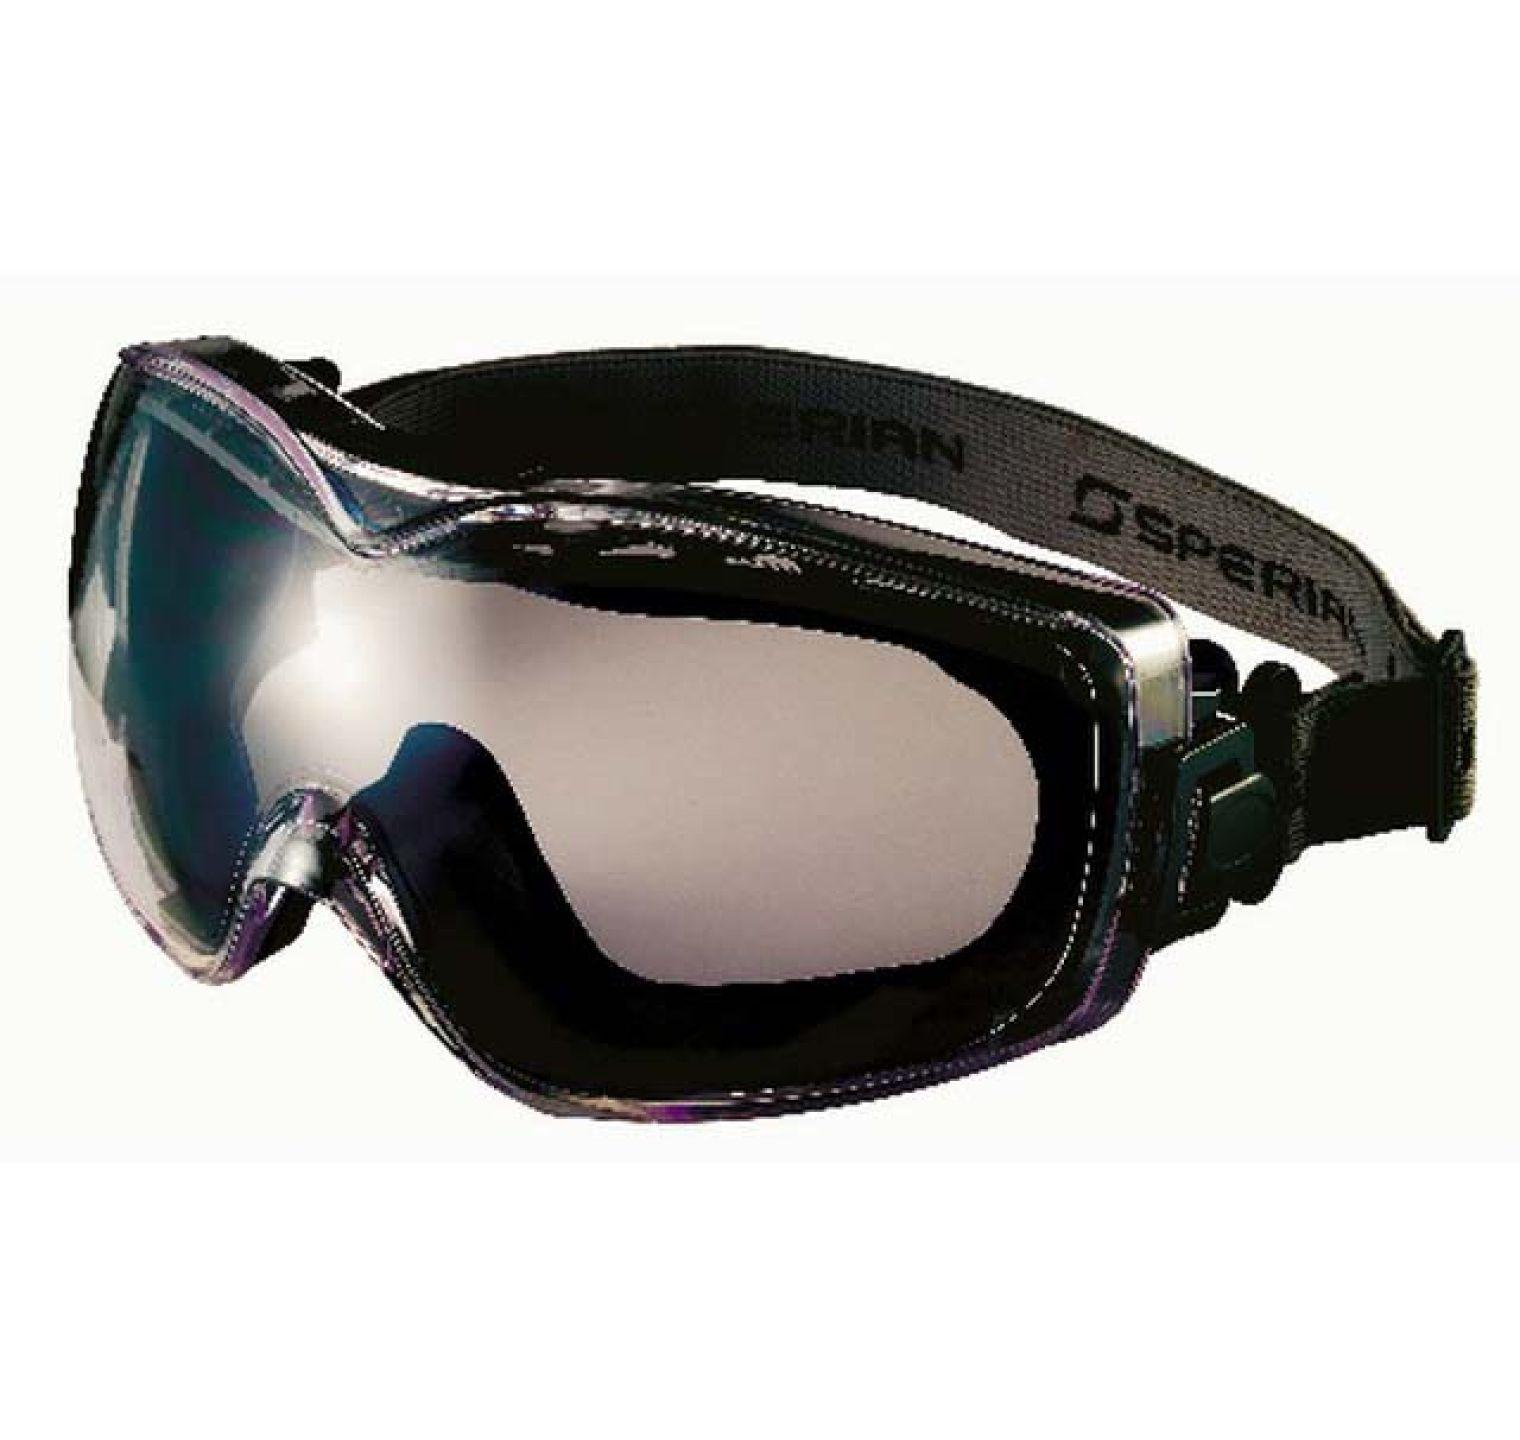 Veiligheidsbril Maxx-pro Blister